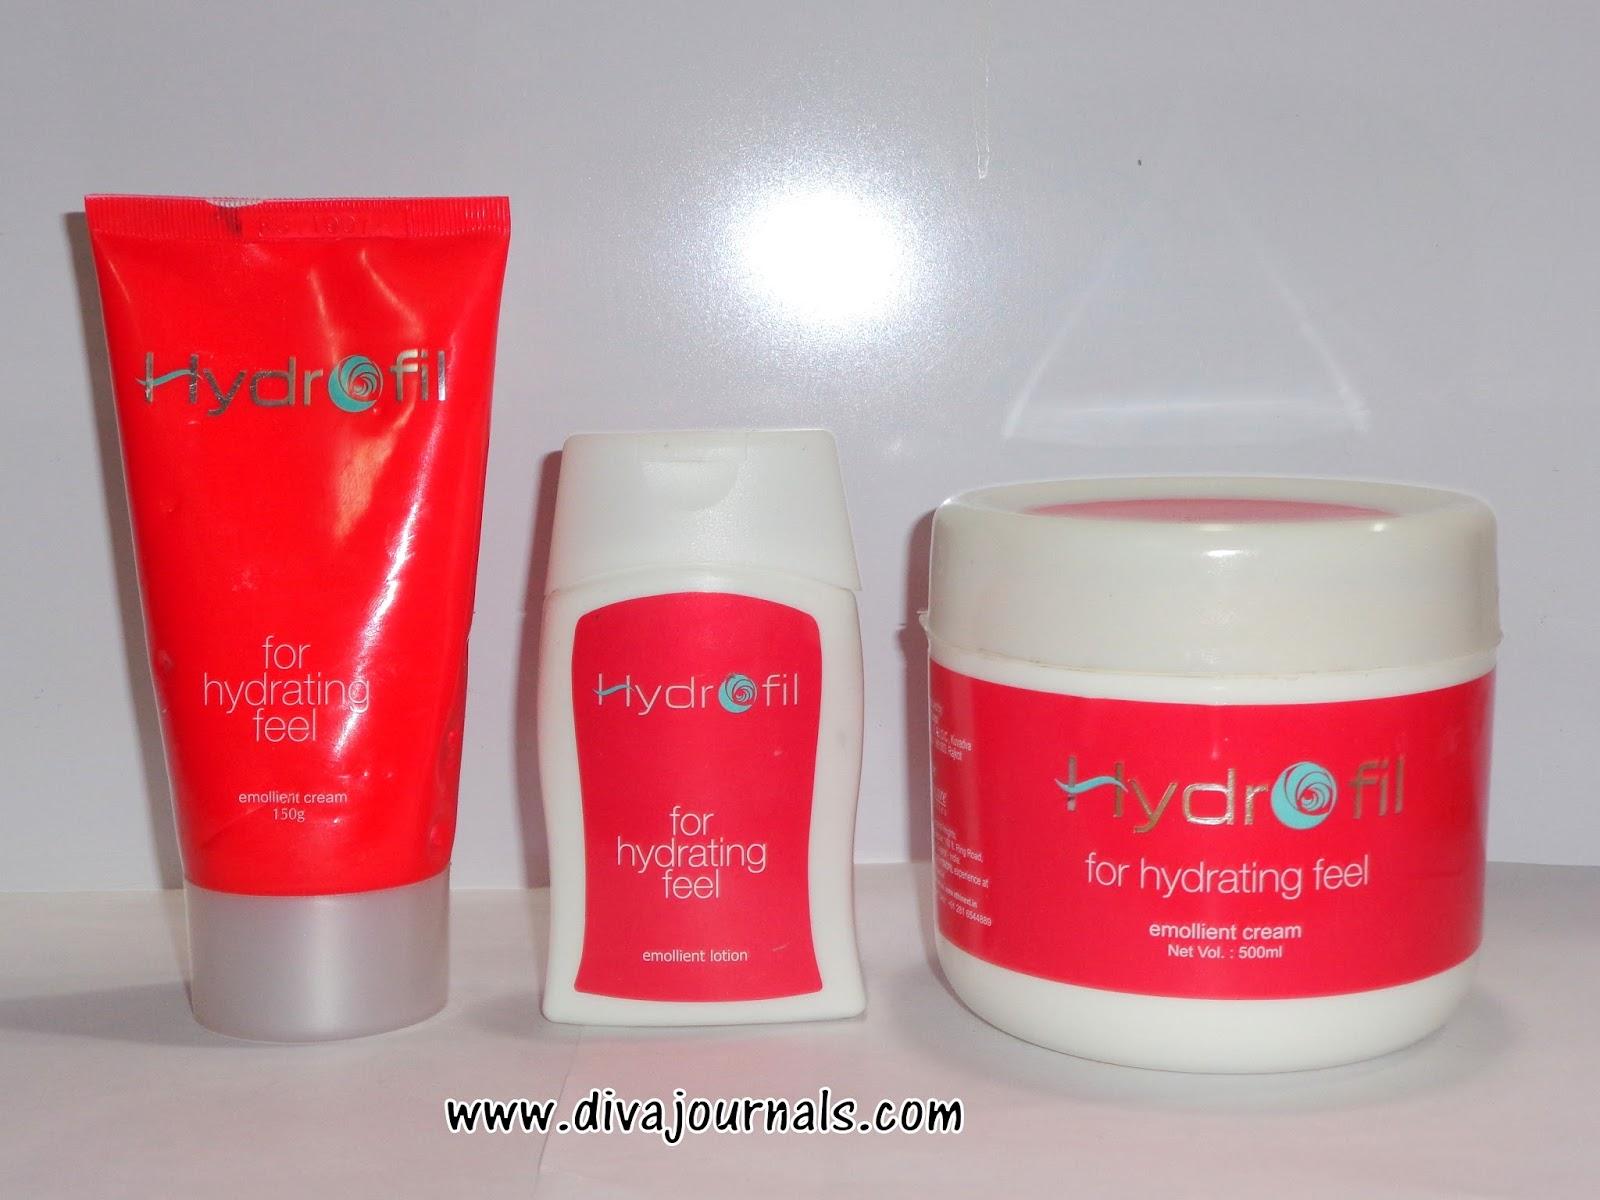 Hydrofil Emollient Cream & Moisturizing Lotion Reviews